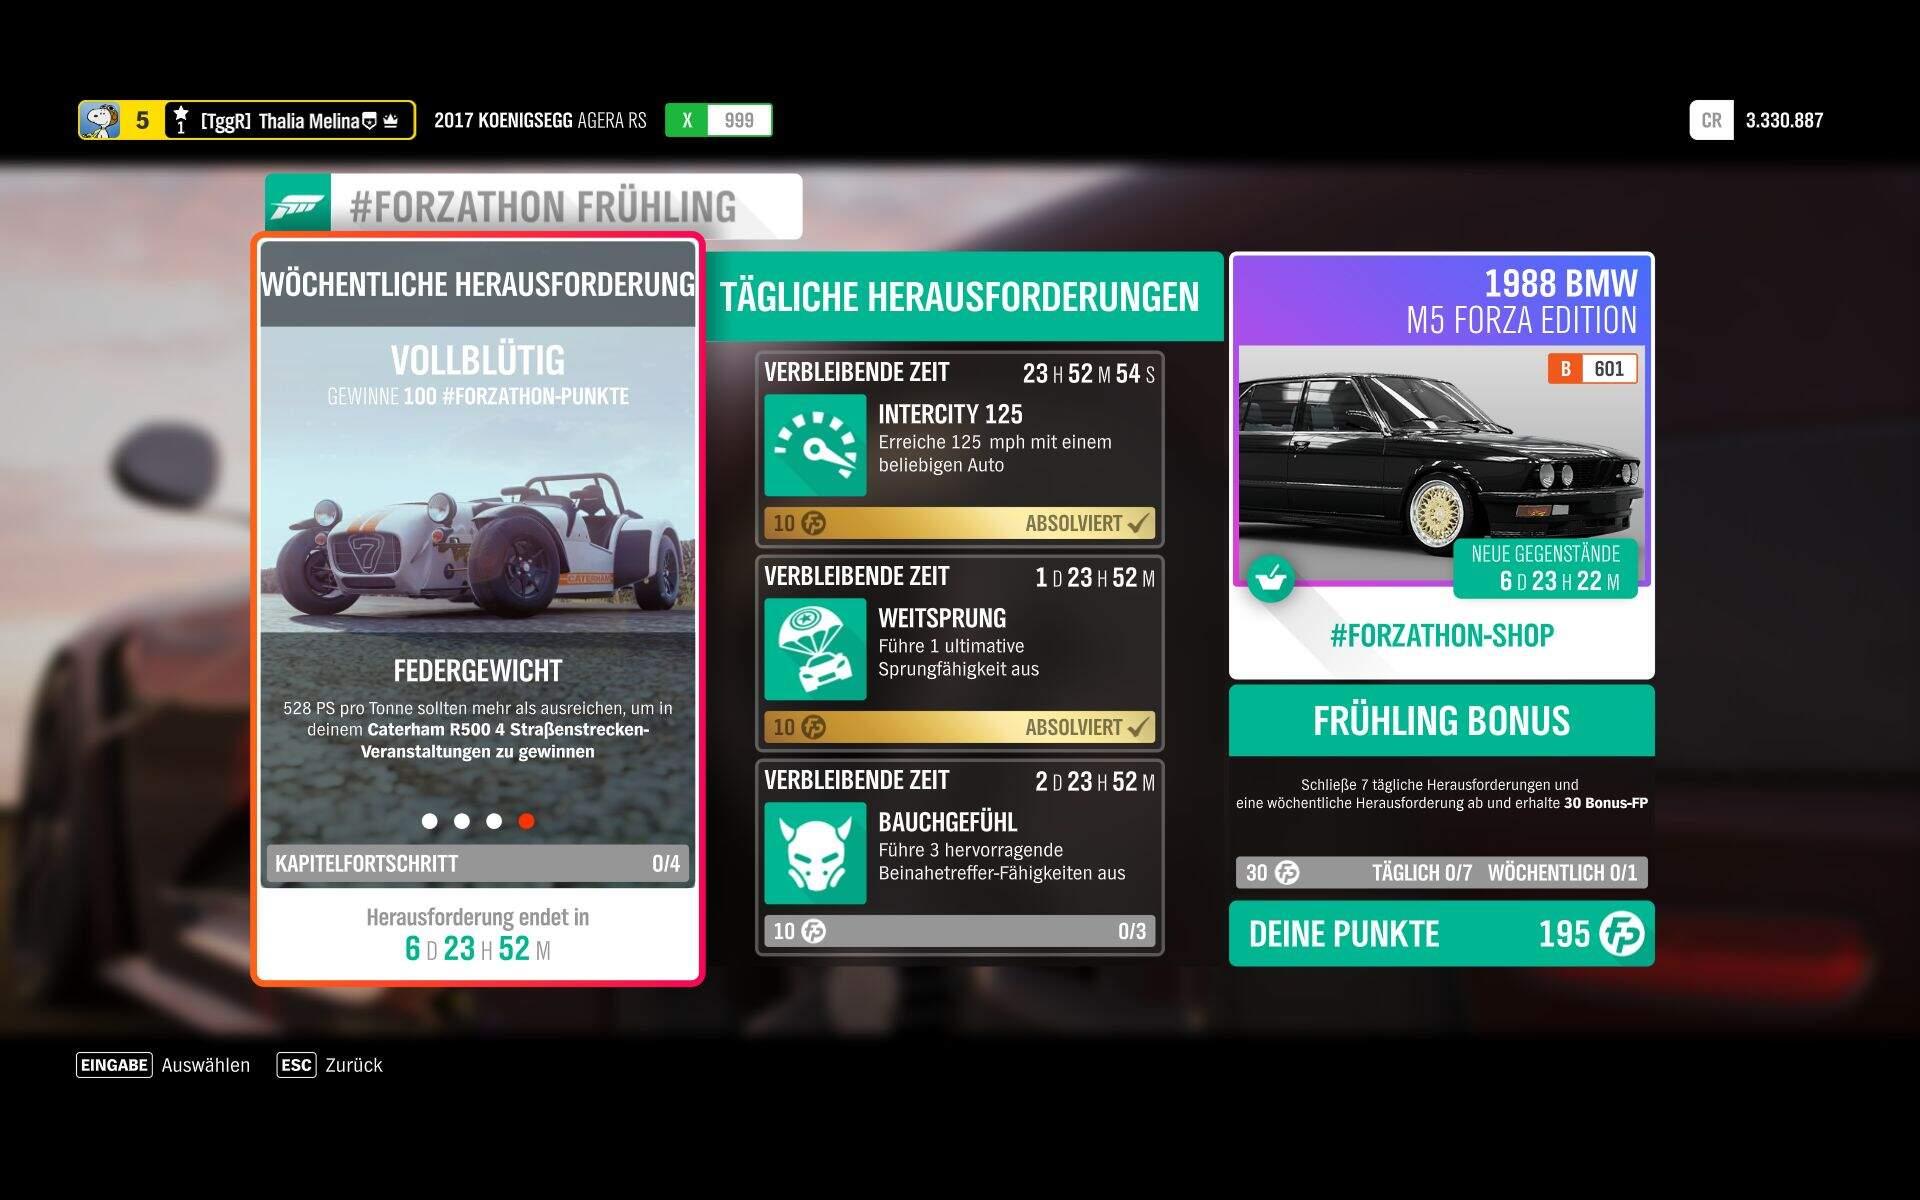 Forza Horizon 4 #Forzathon KW 46 – Vollblütig Aufgabe 4